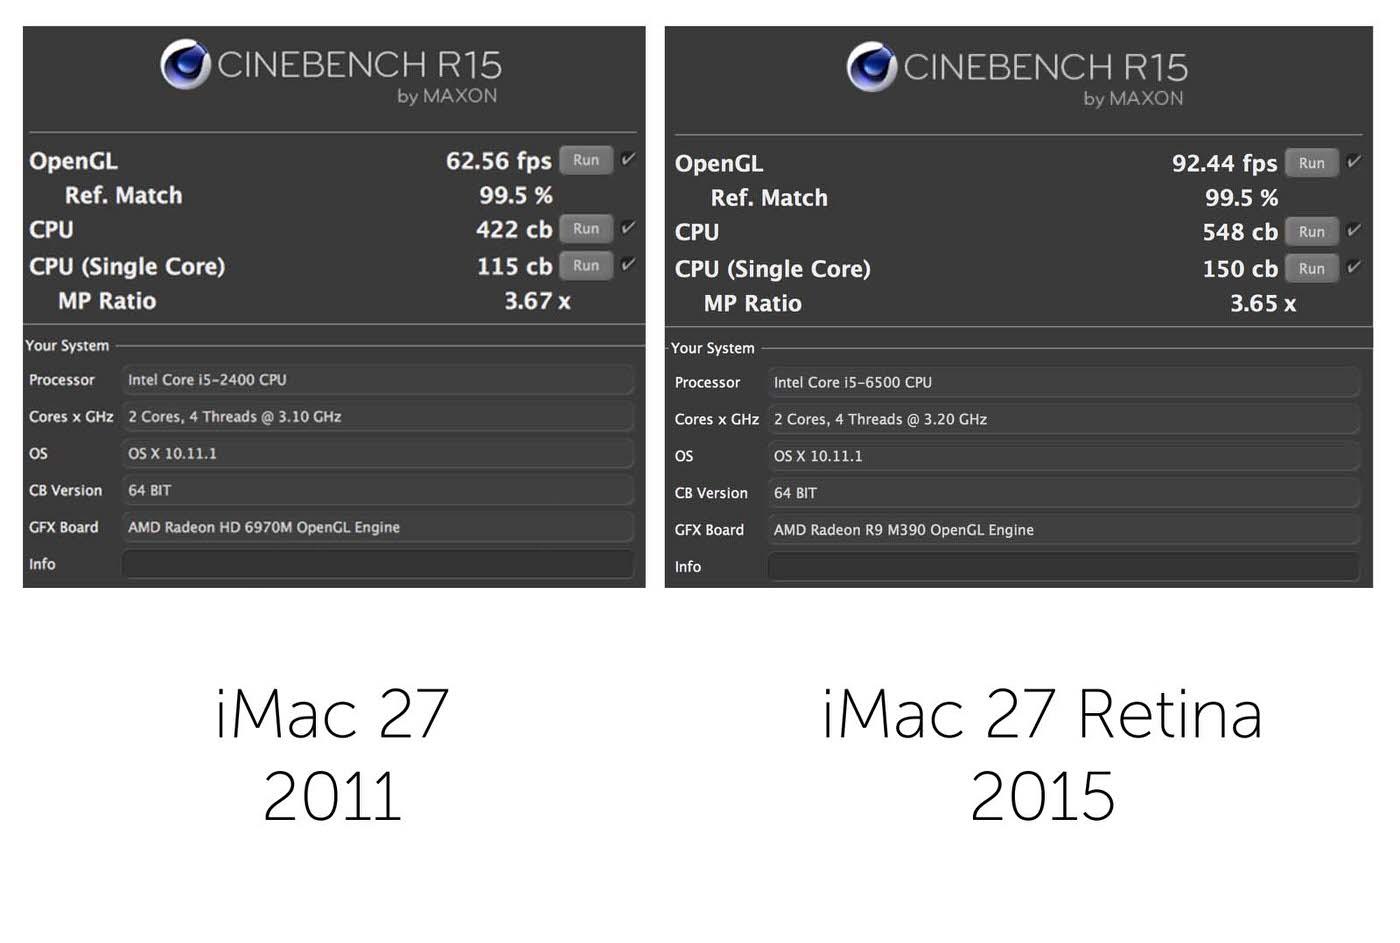 Mac 02-1